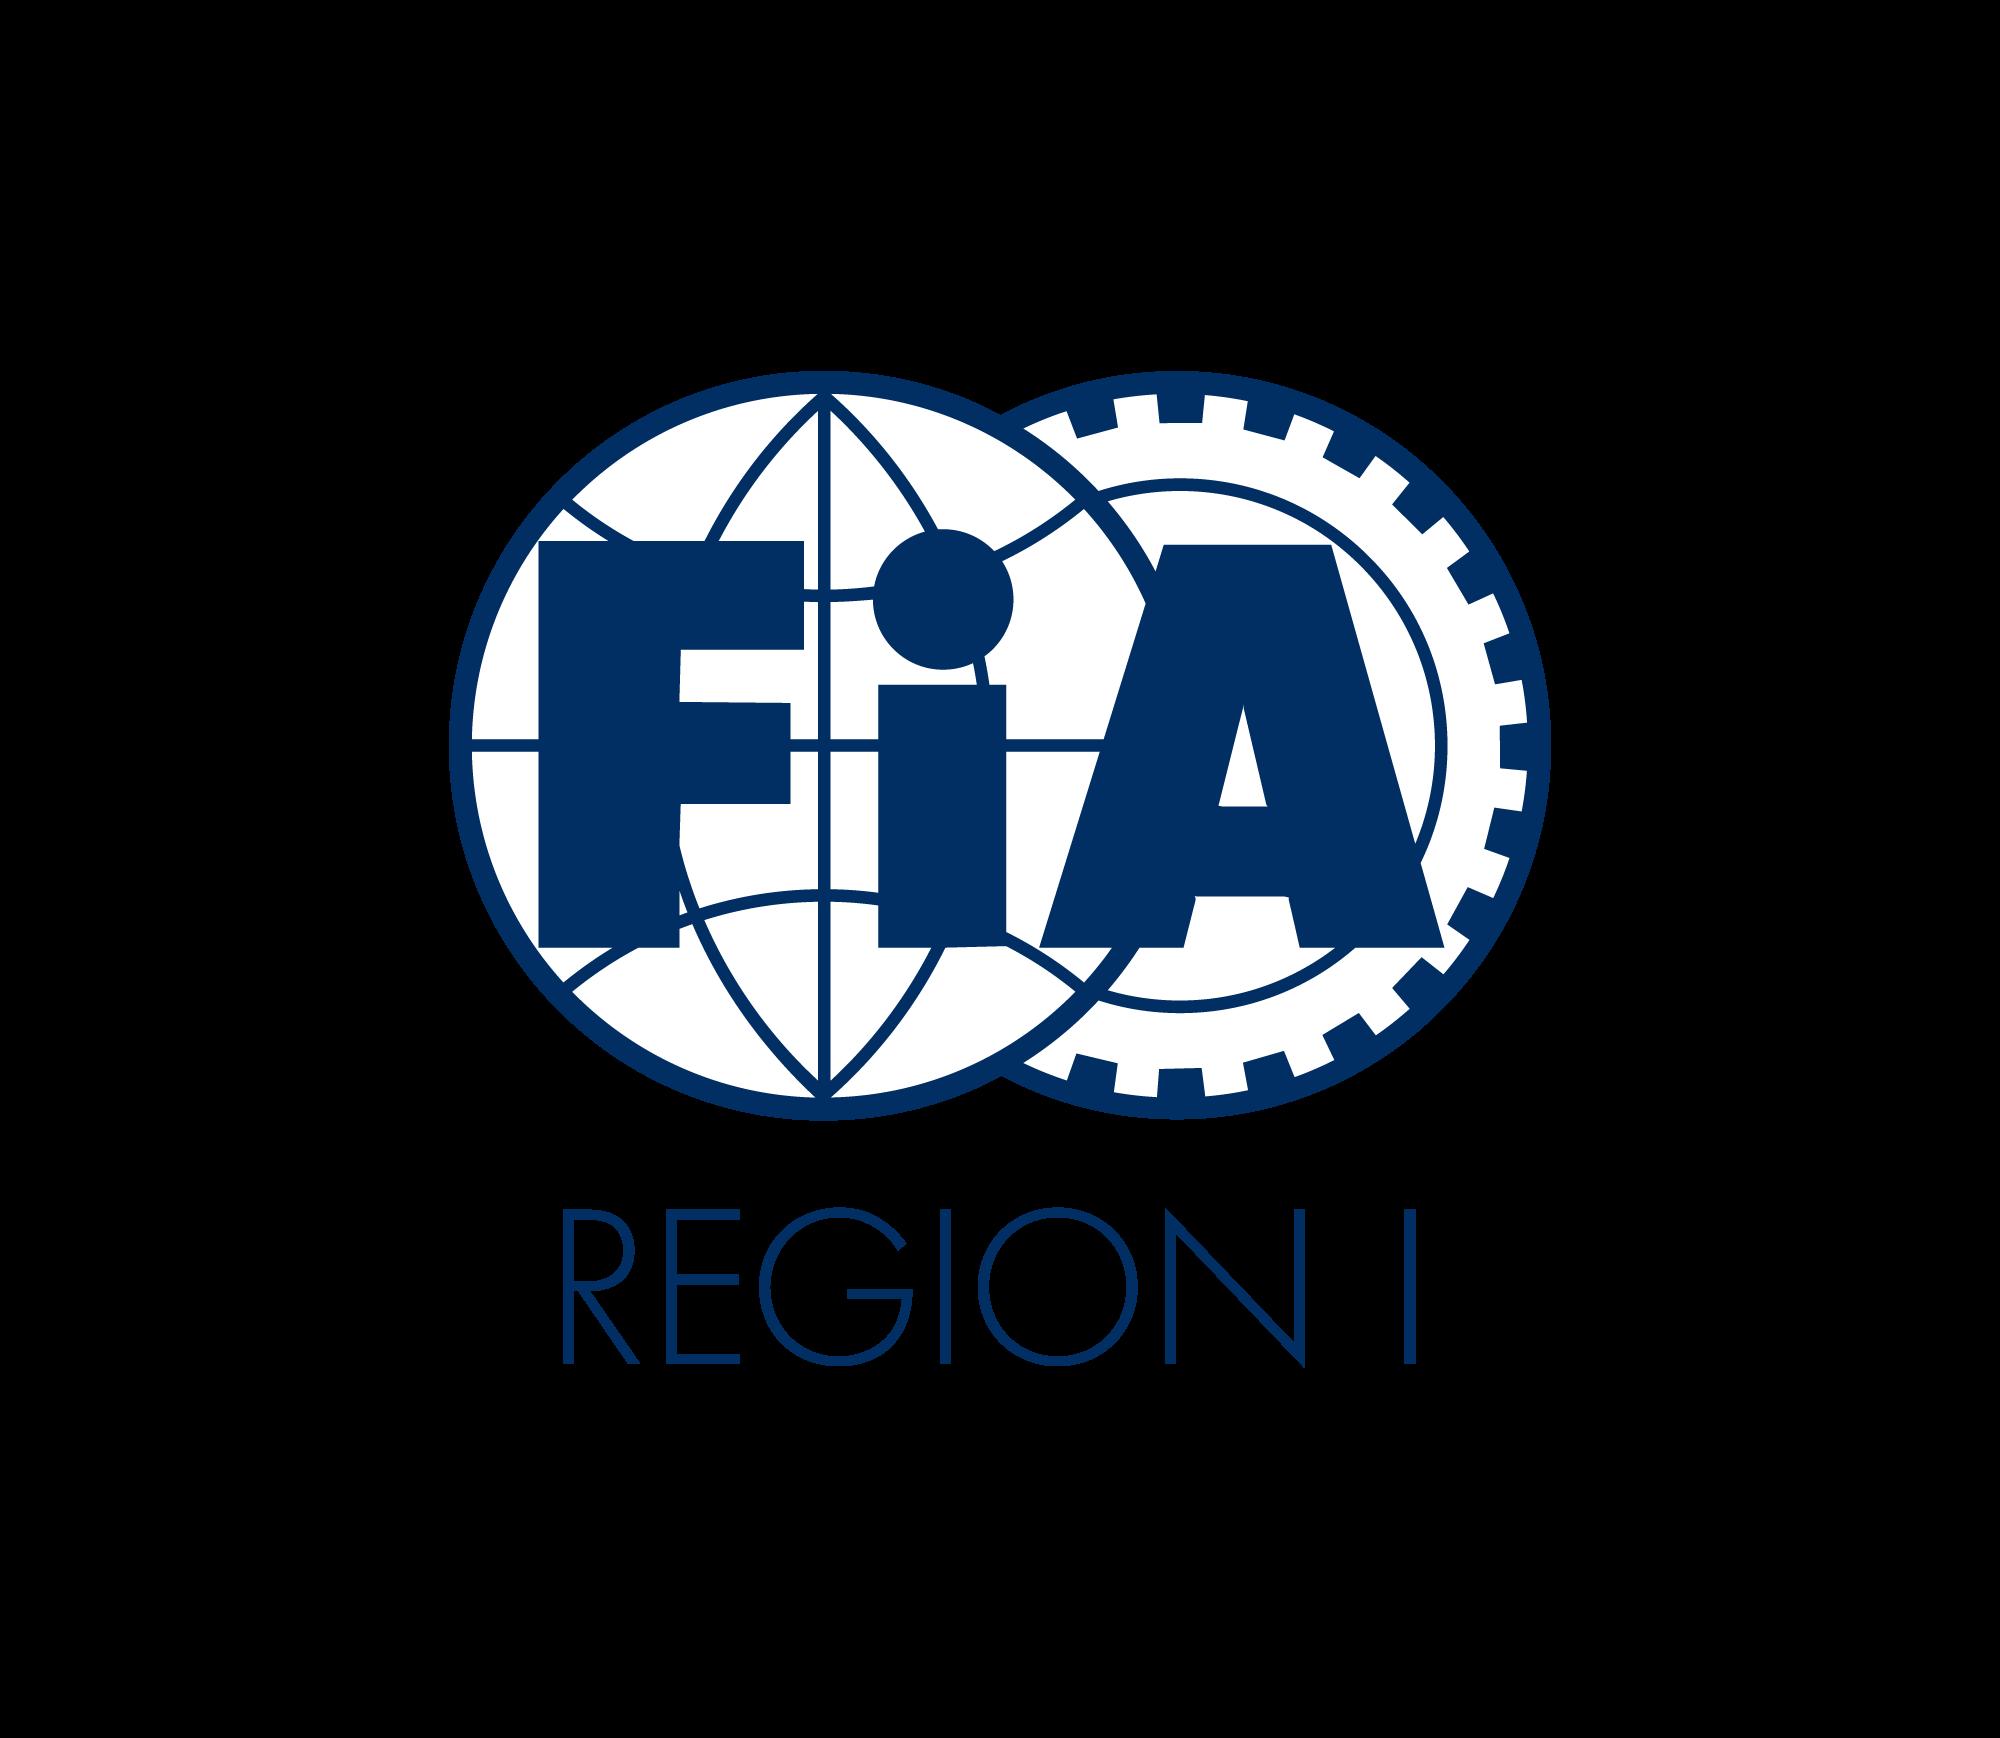 FIA-REGION-I-logo-mini-blue-Lo-Res.png